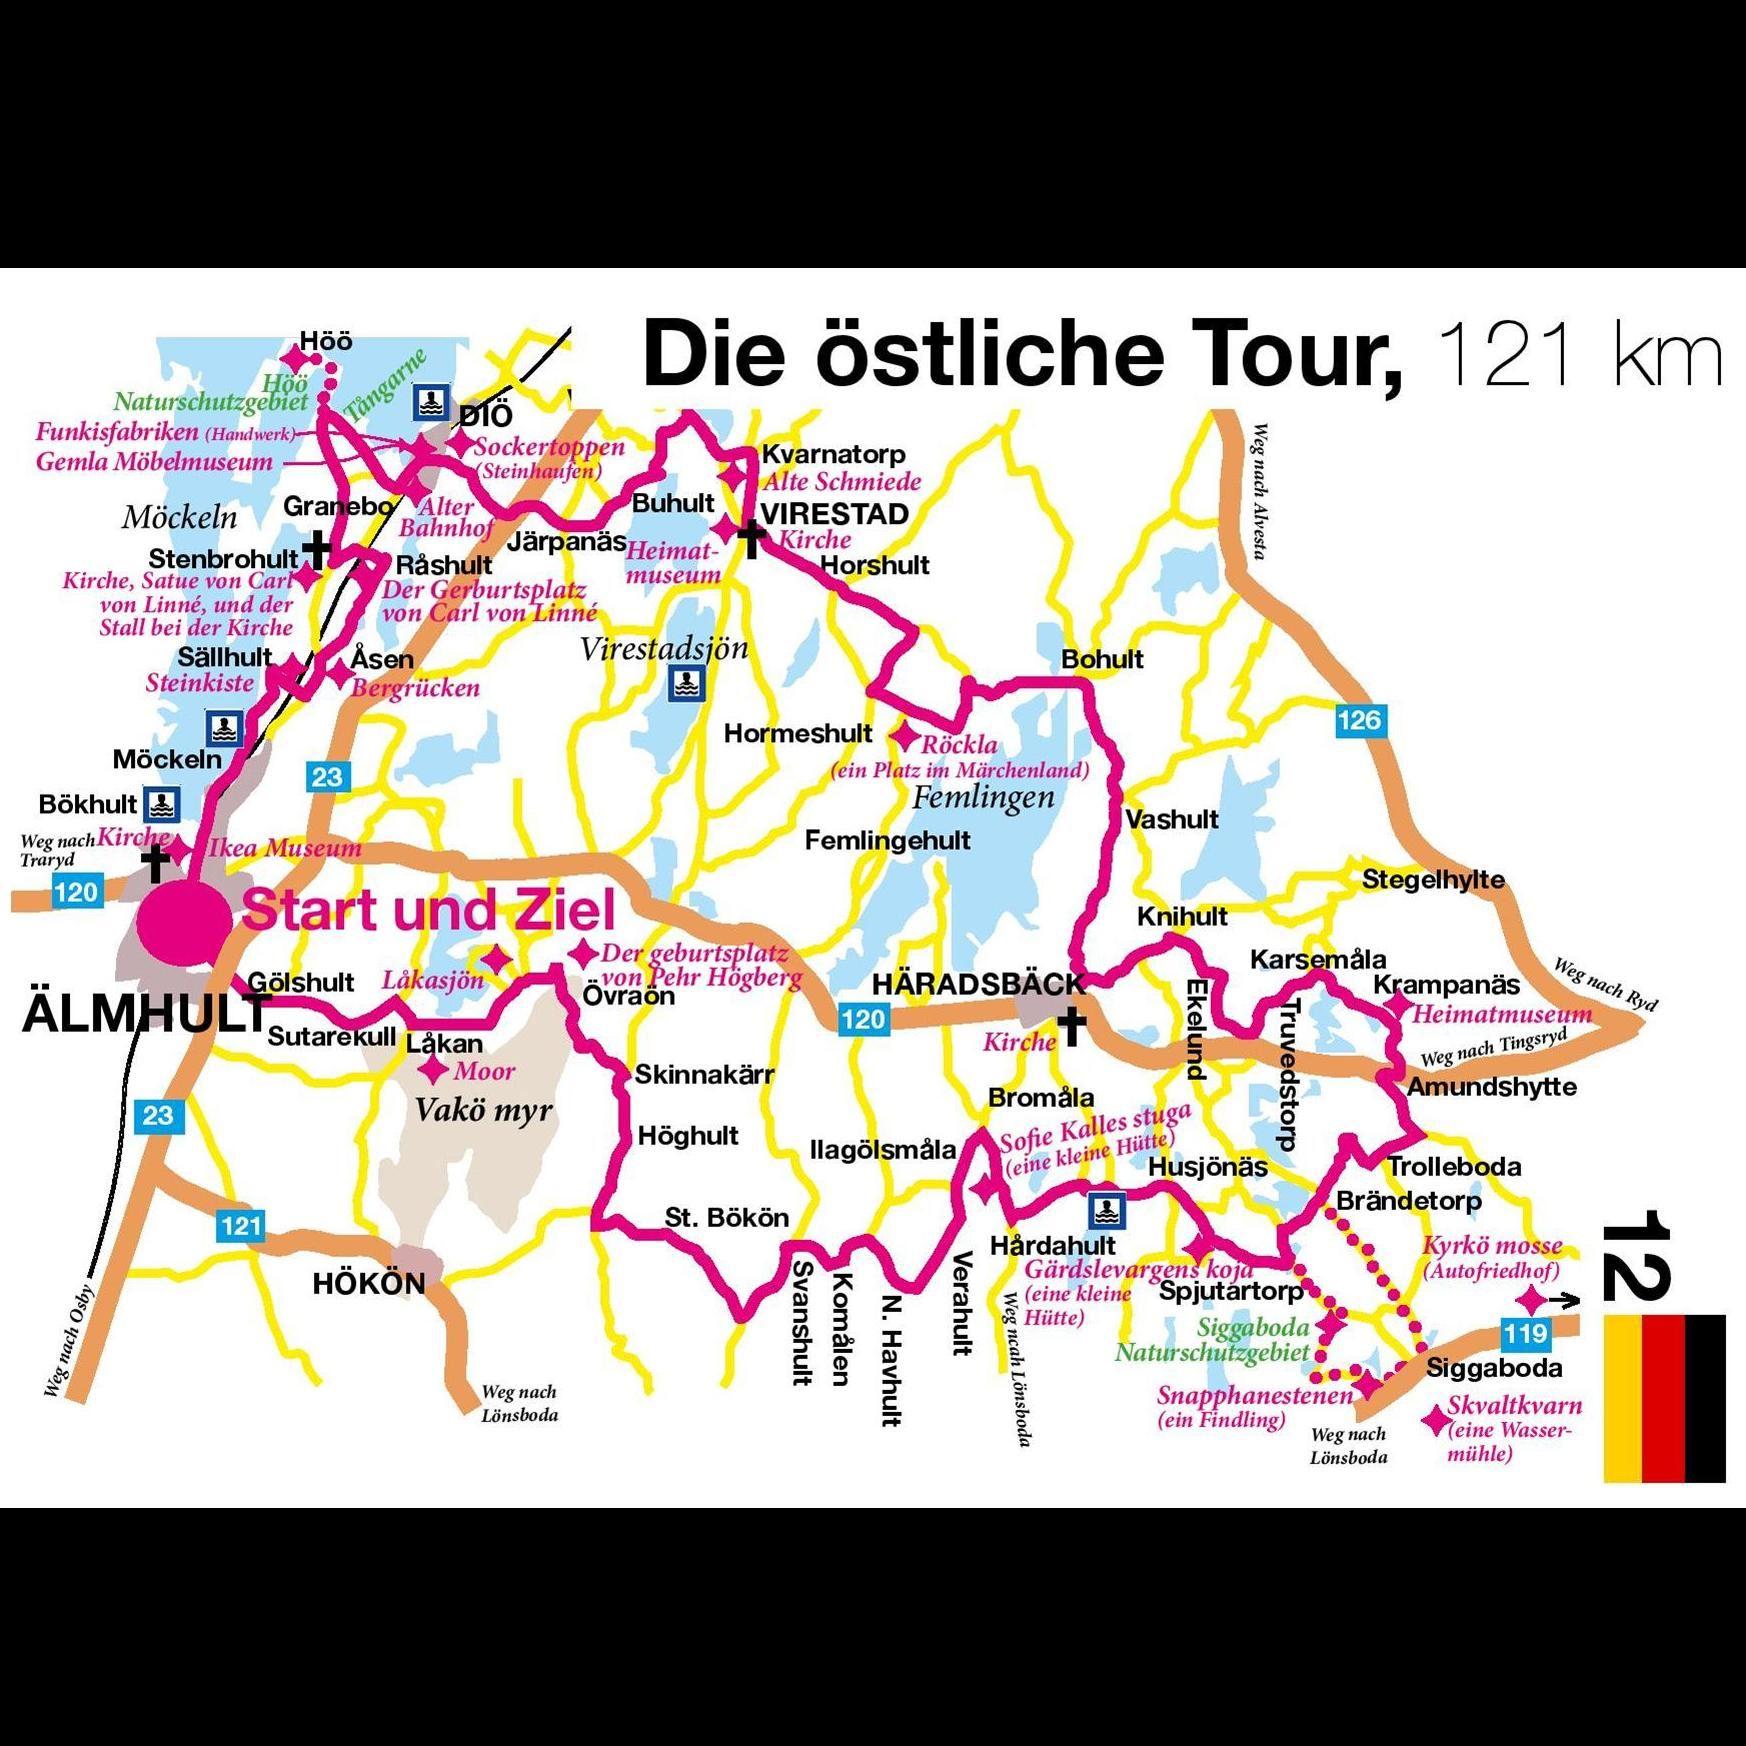 Bicycle tour - The Eastern Tour - 121 km